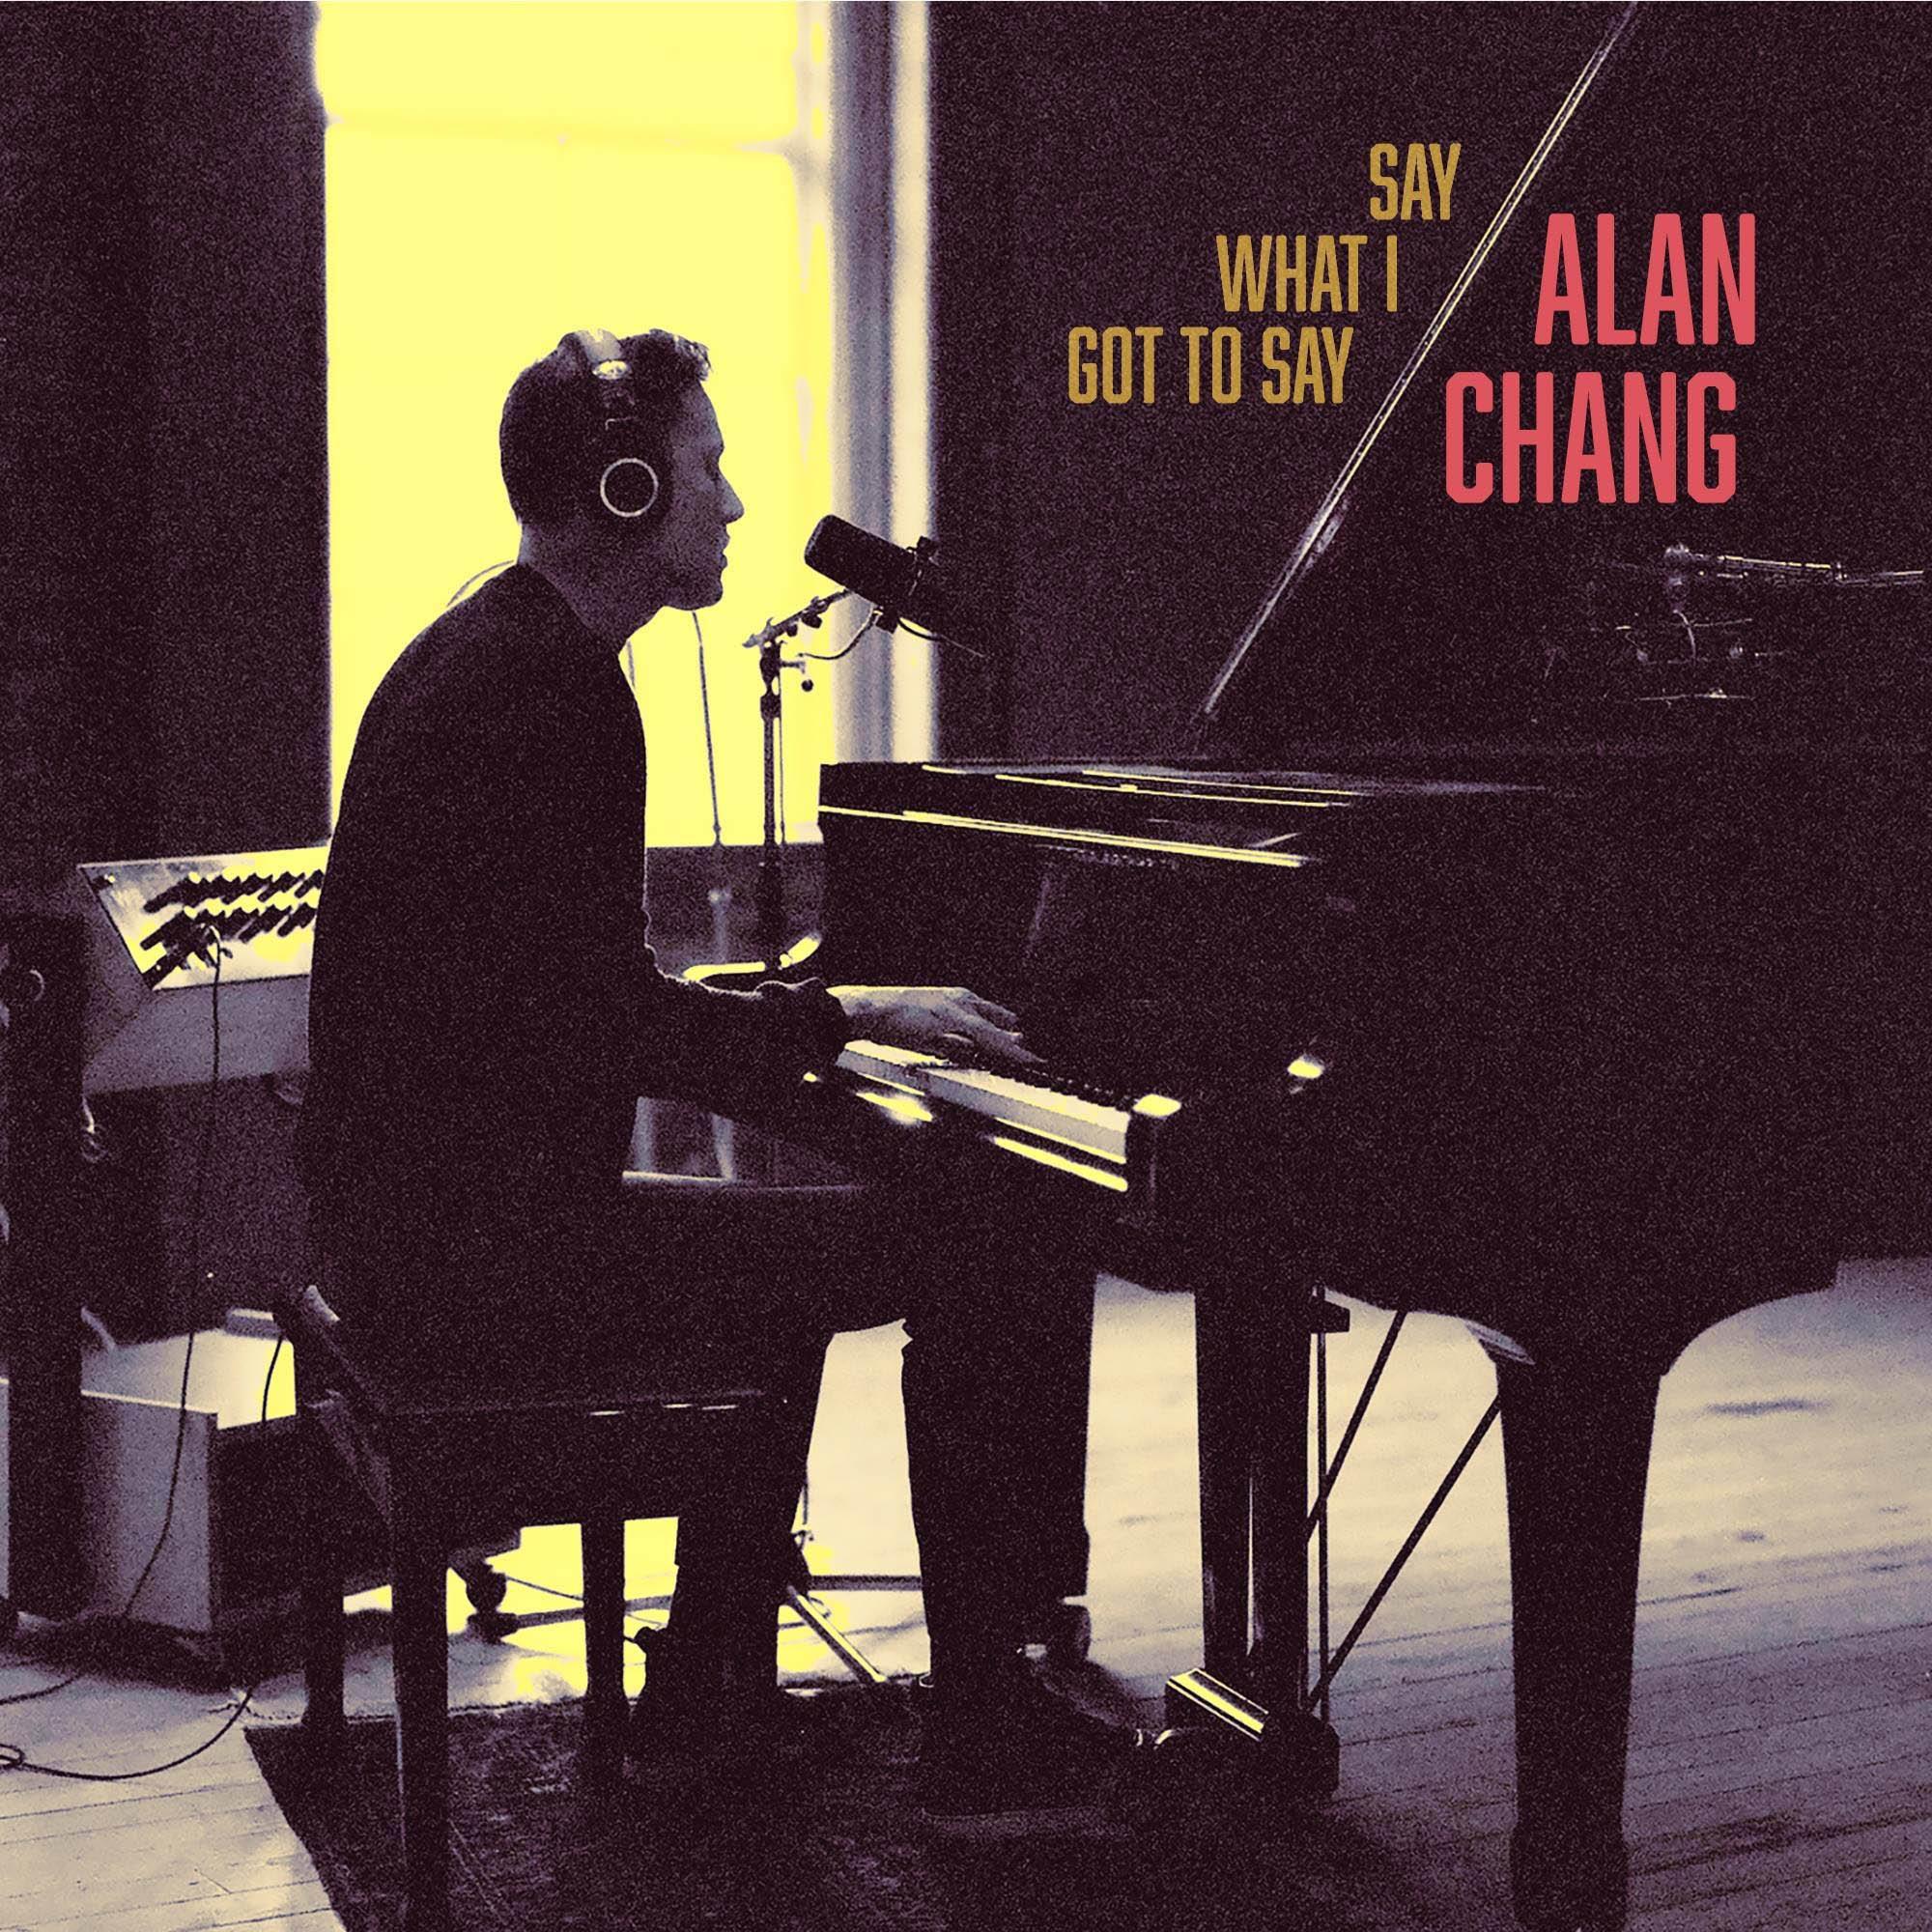 Alan Chang Say What I Got To Say